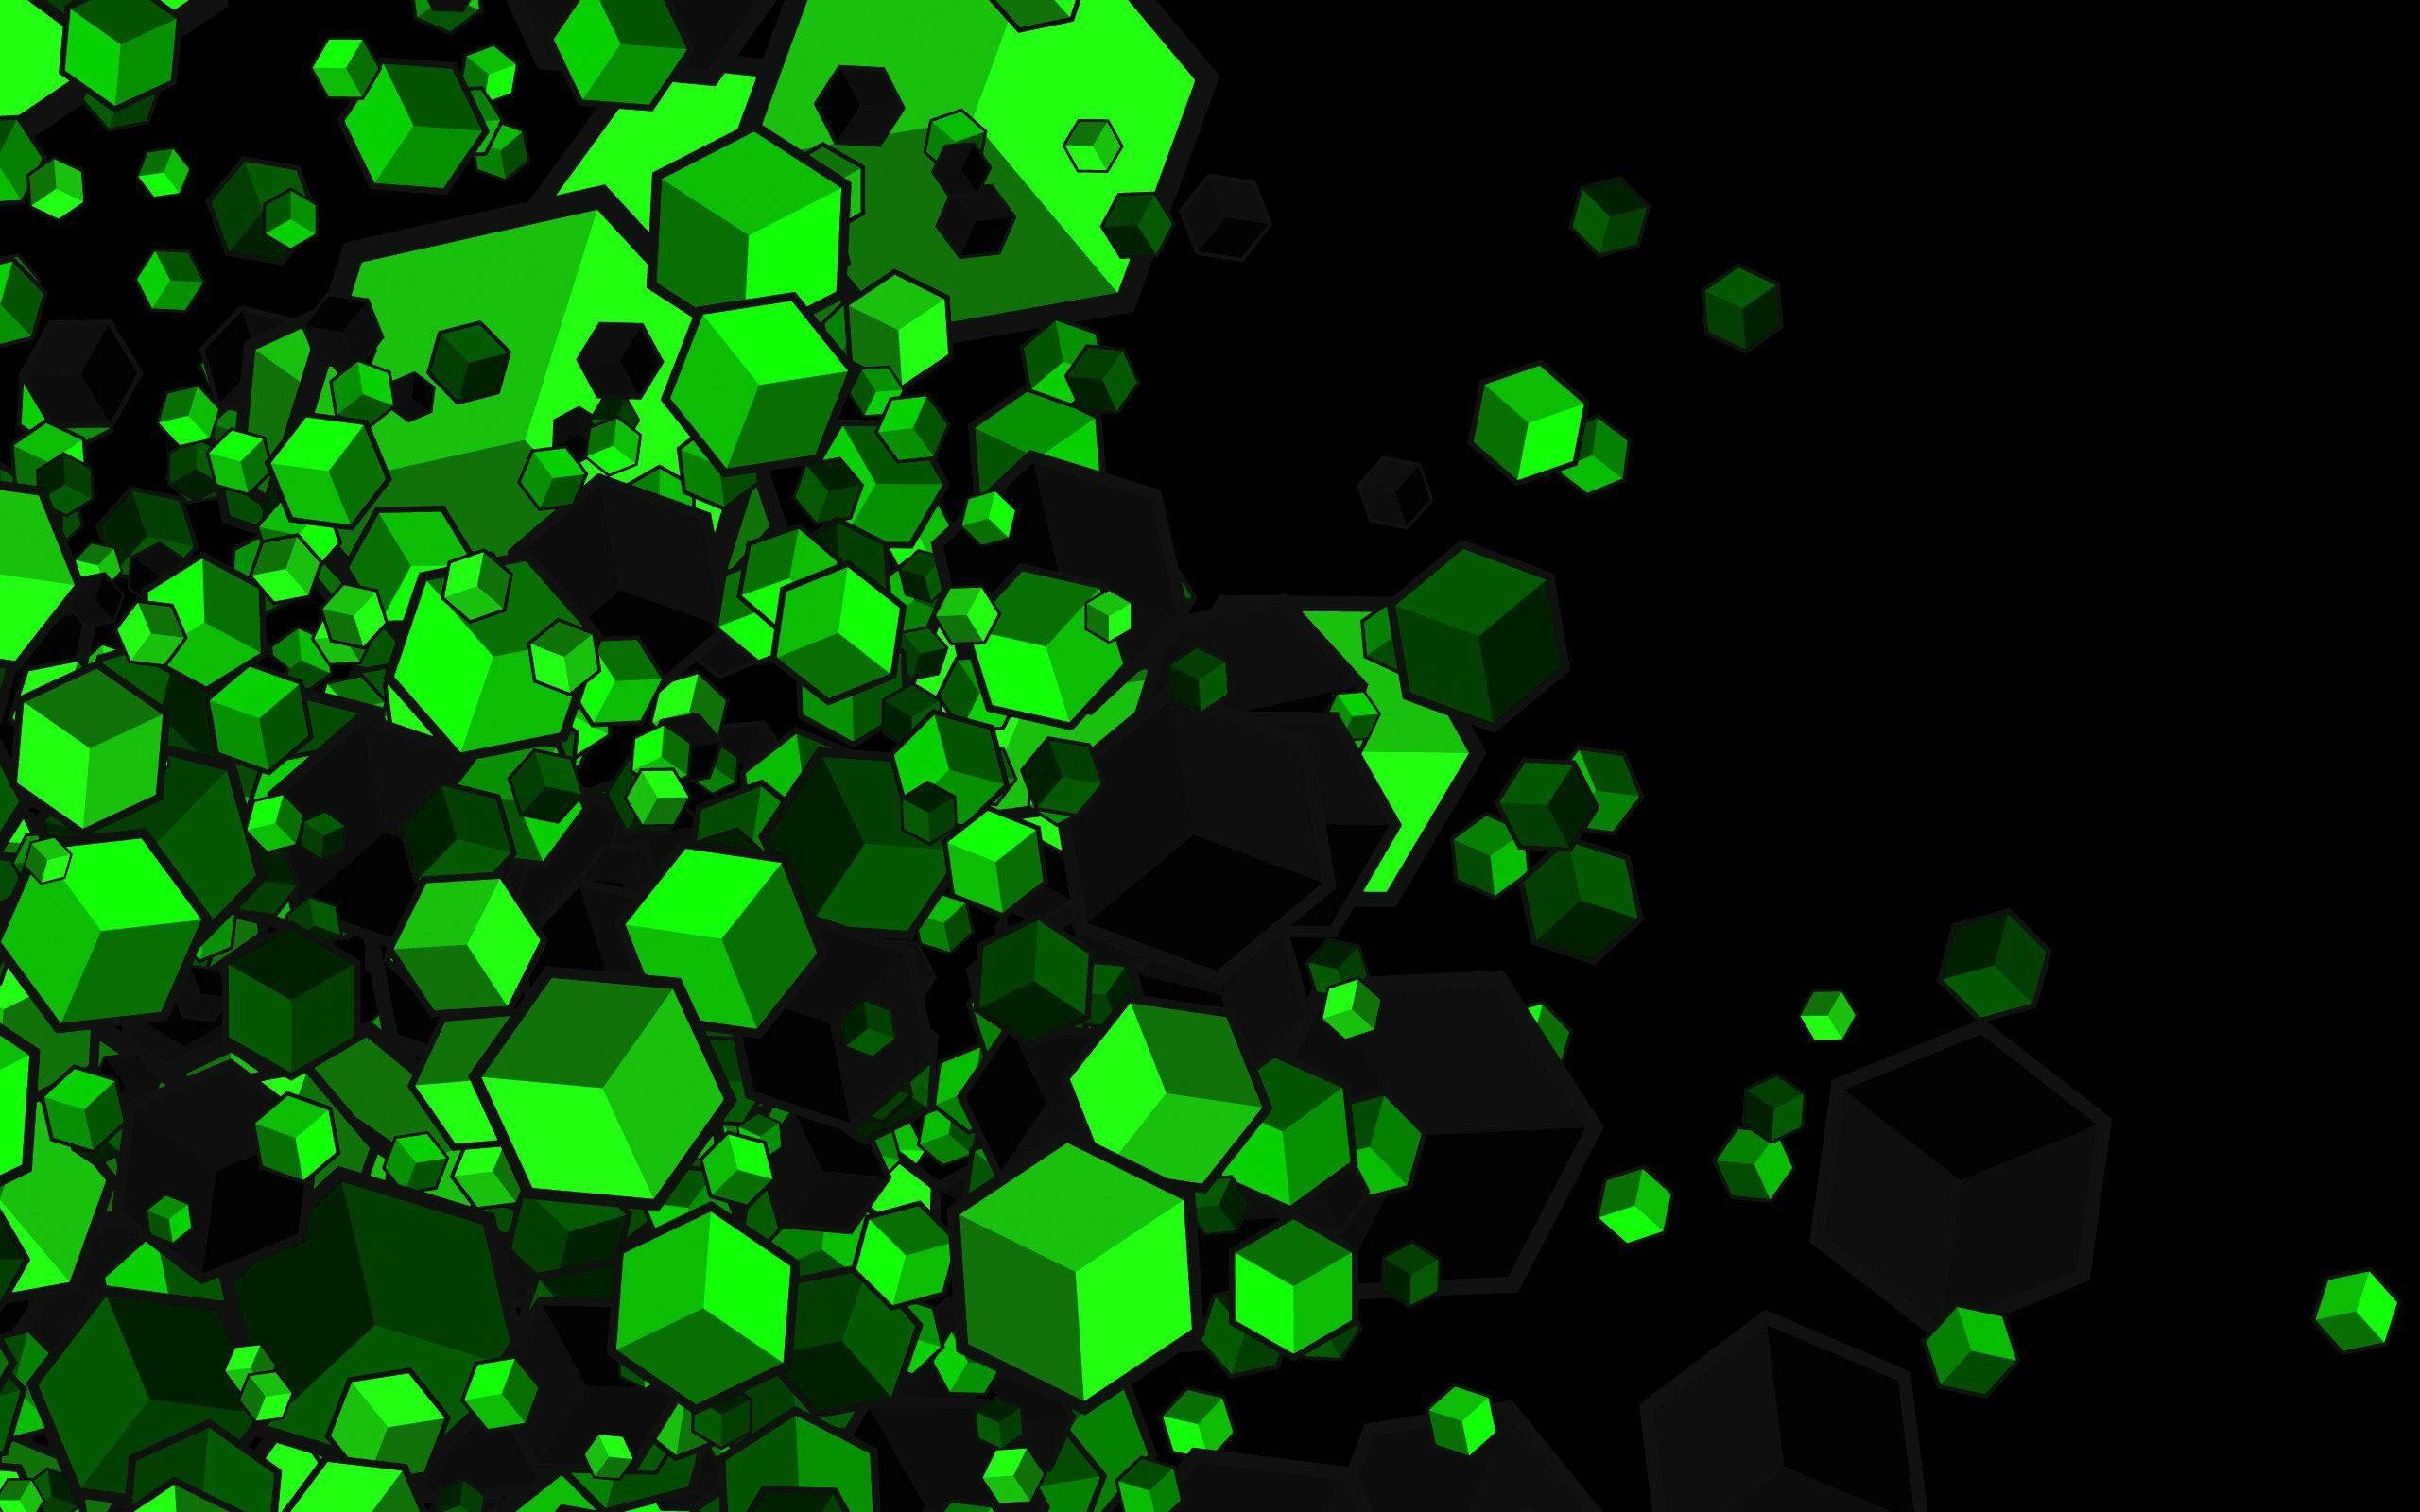 Green Gaming PC Wallpaper